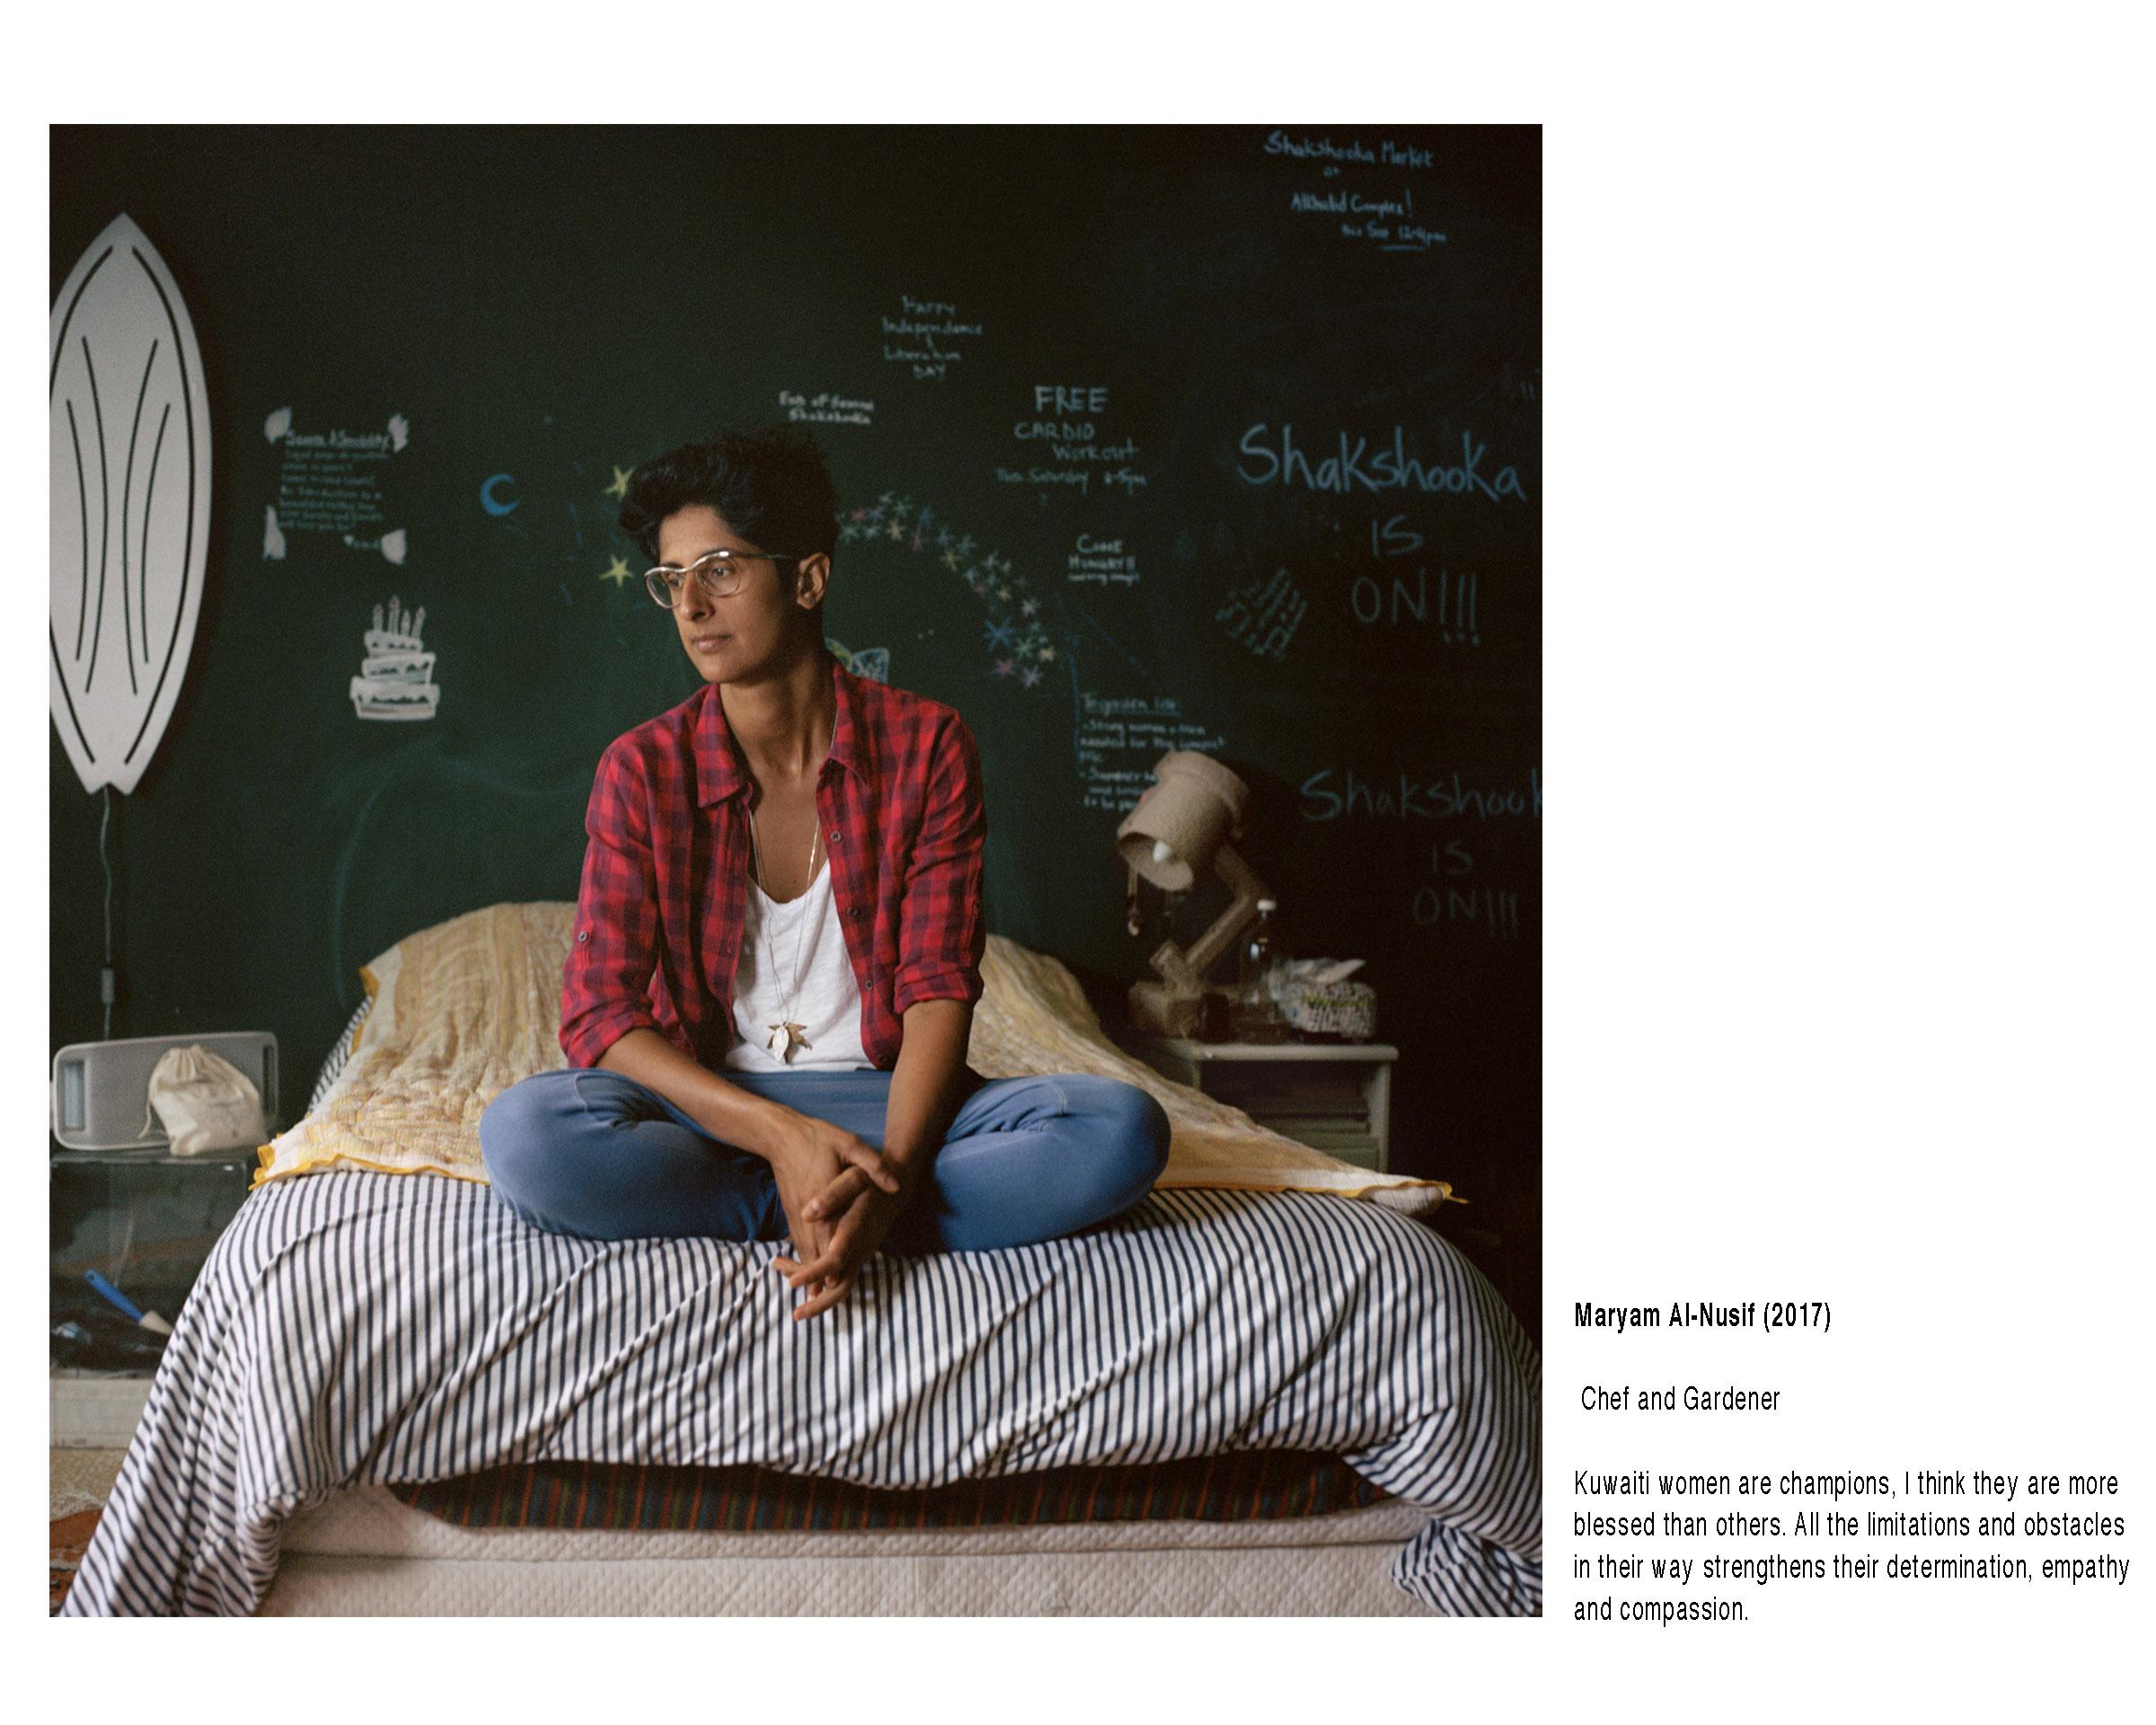 Maryam Al-Nusif .jpg